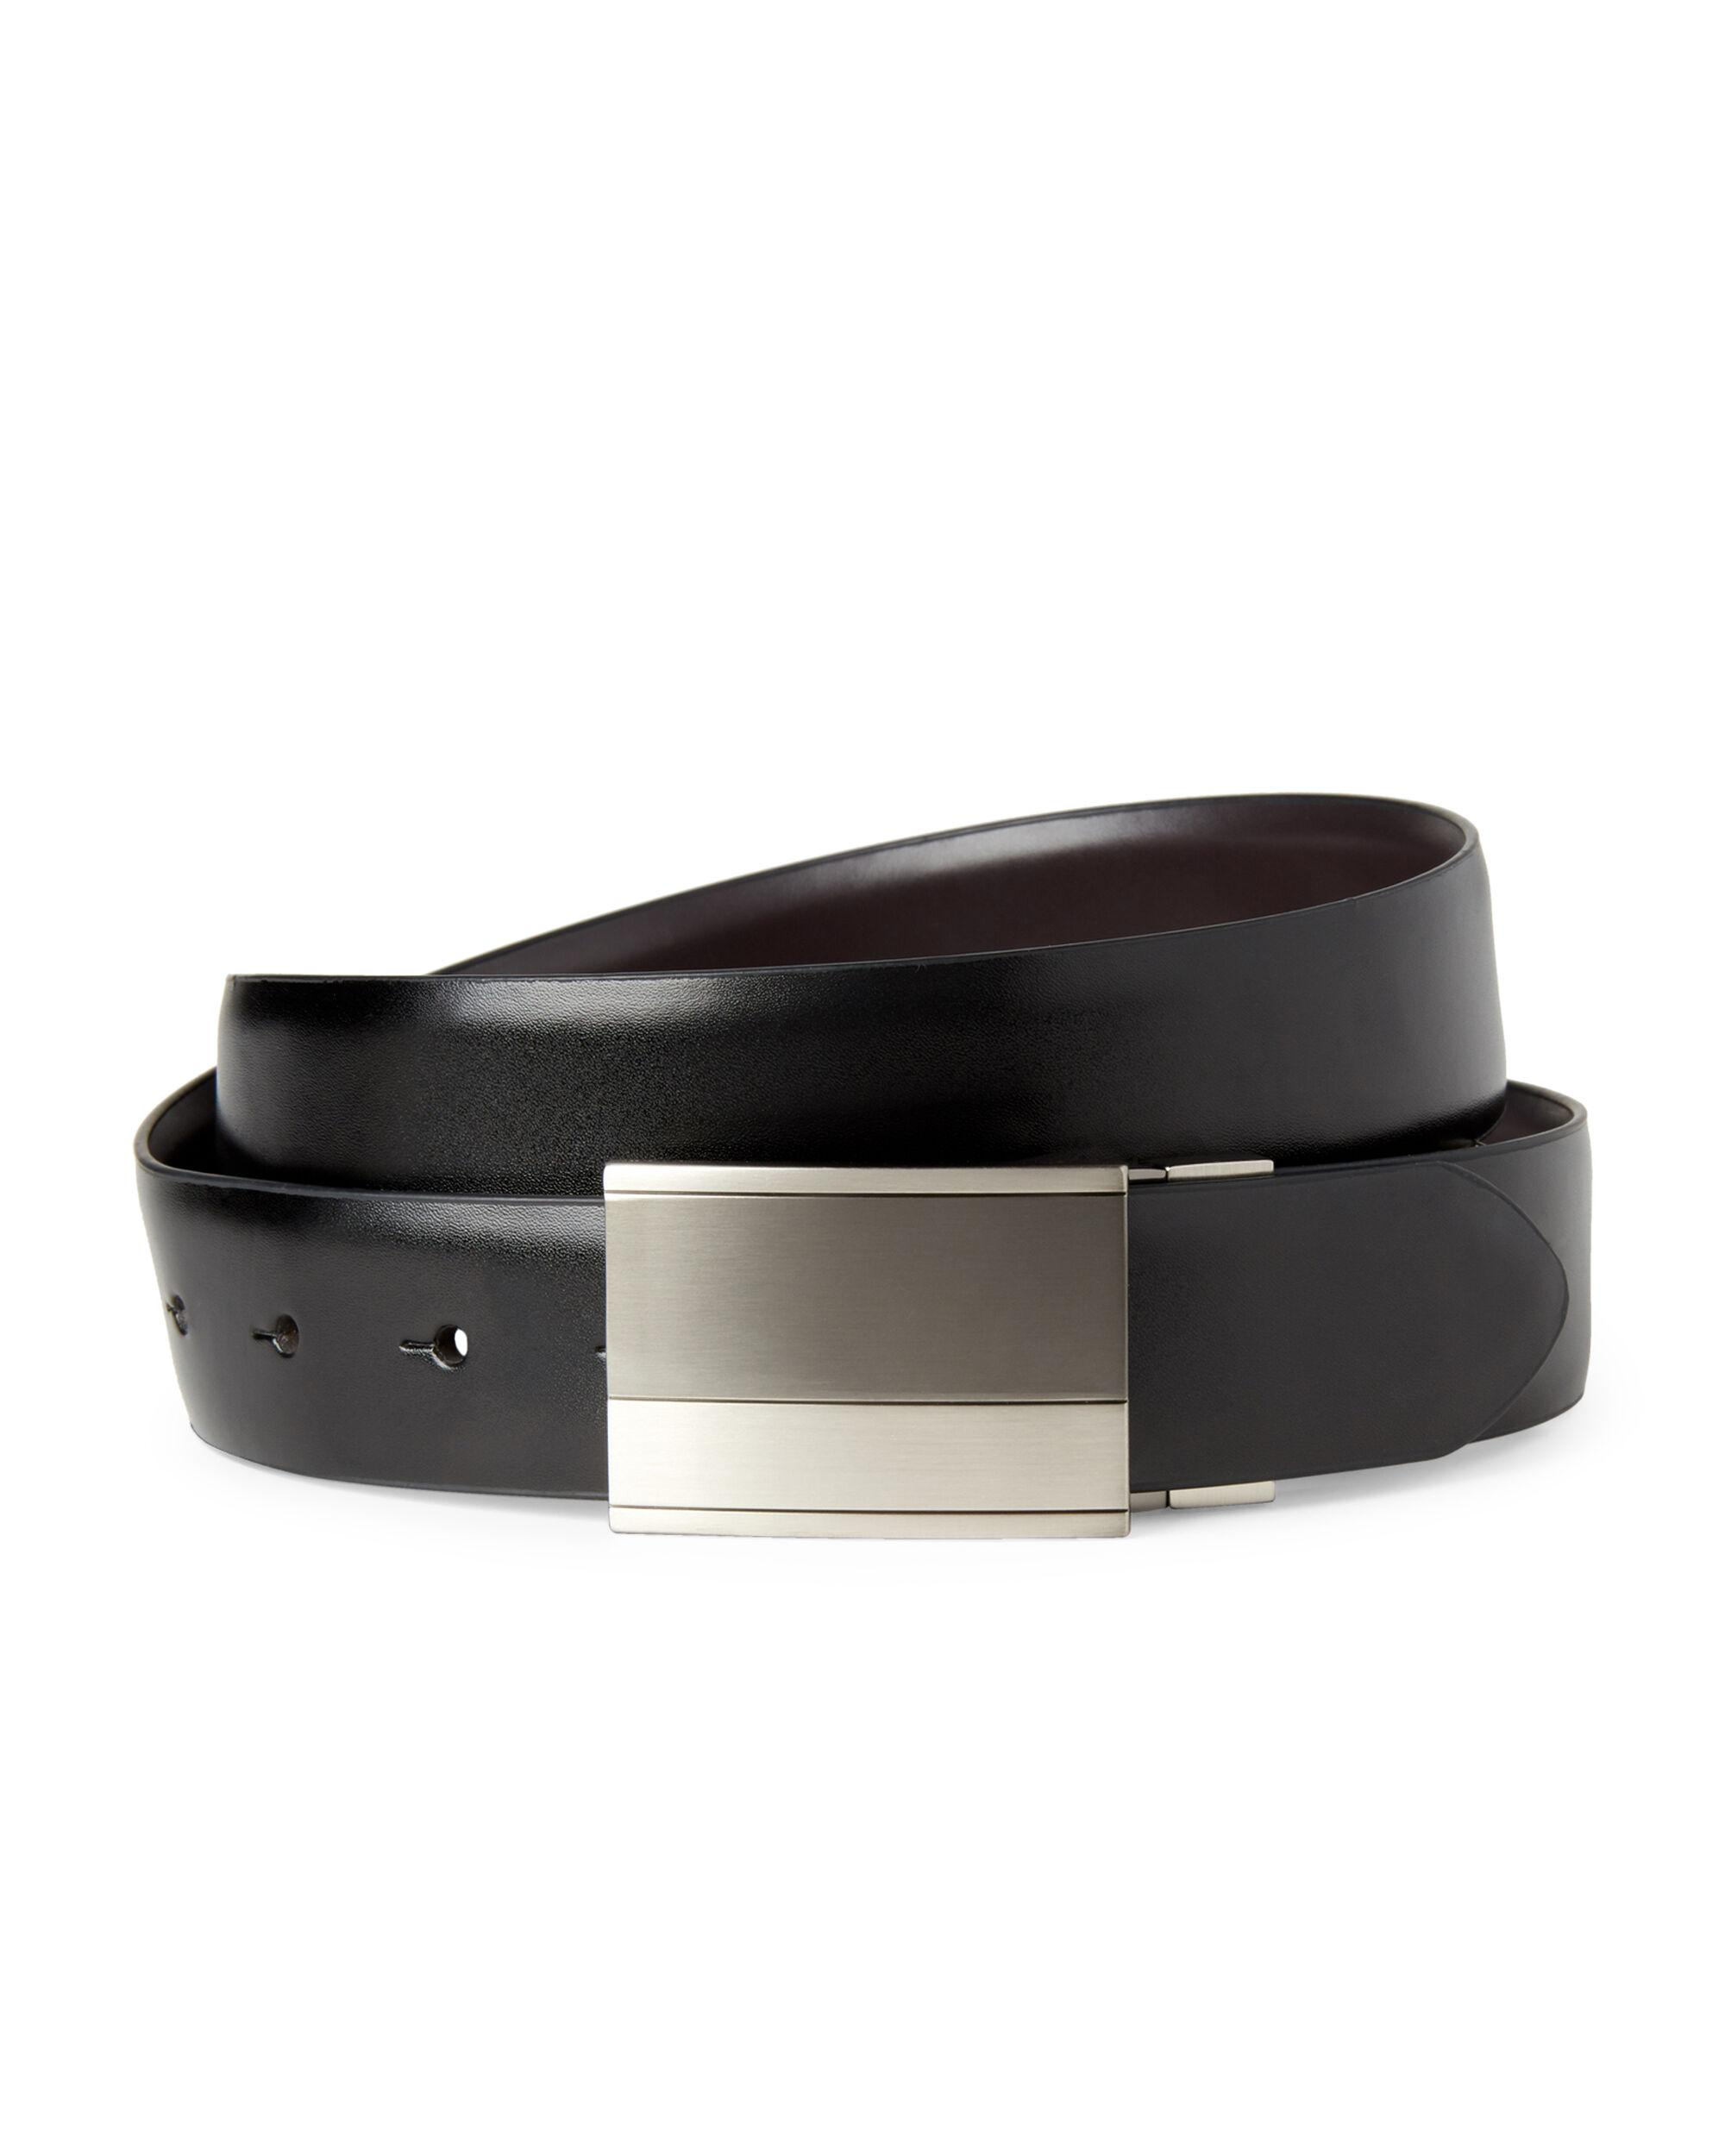 Grace leather belt - black POLO Belts | Superbalist.com